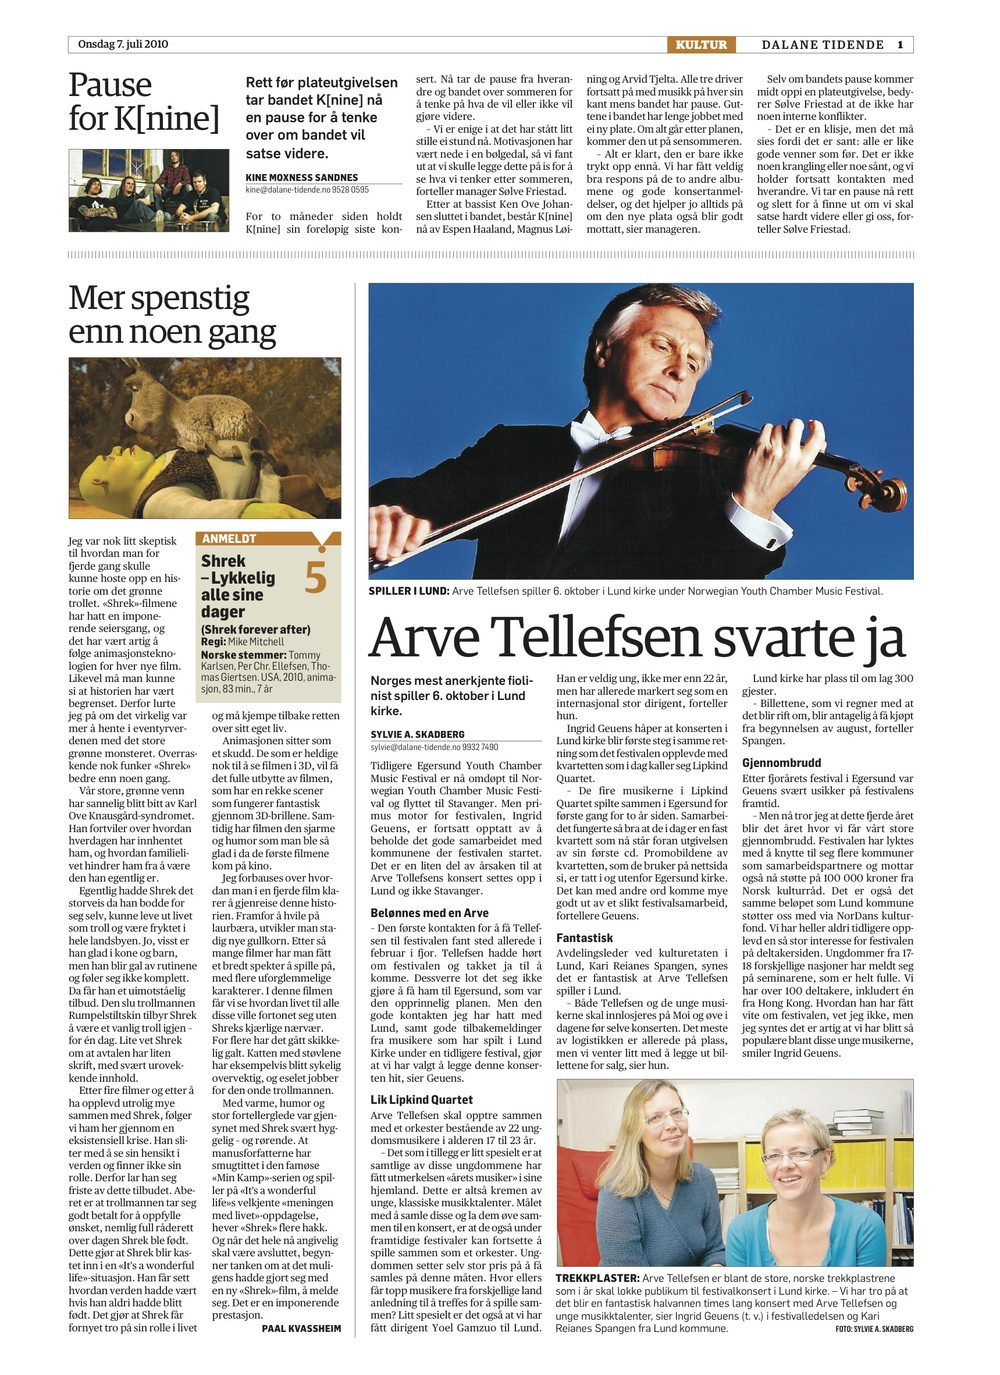 Dalane Tidende - 7. July 2010